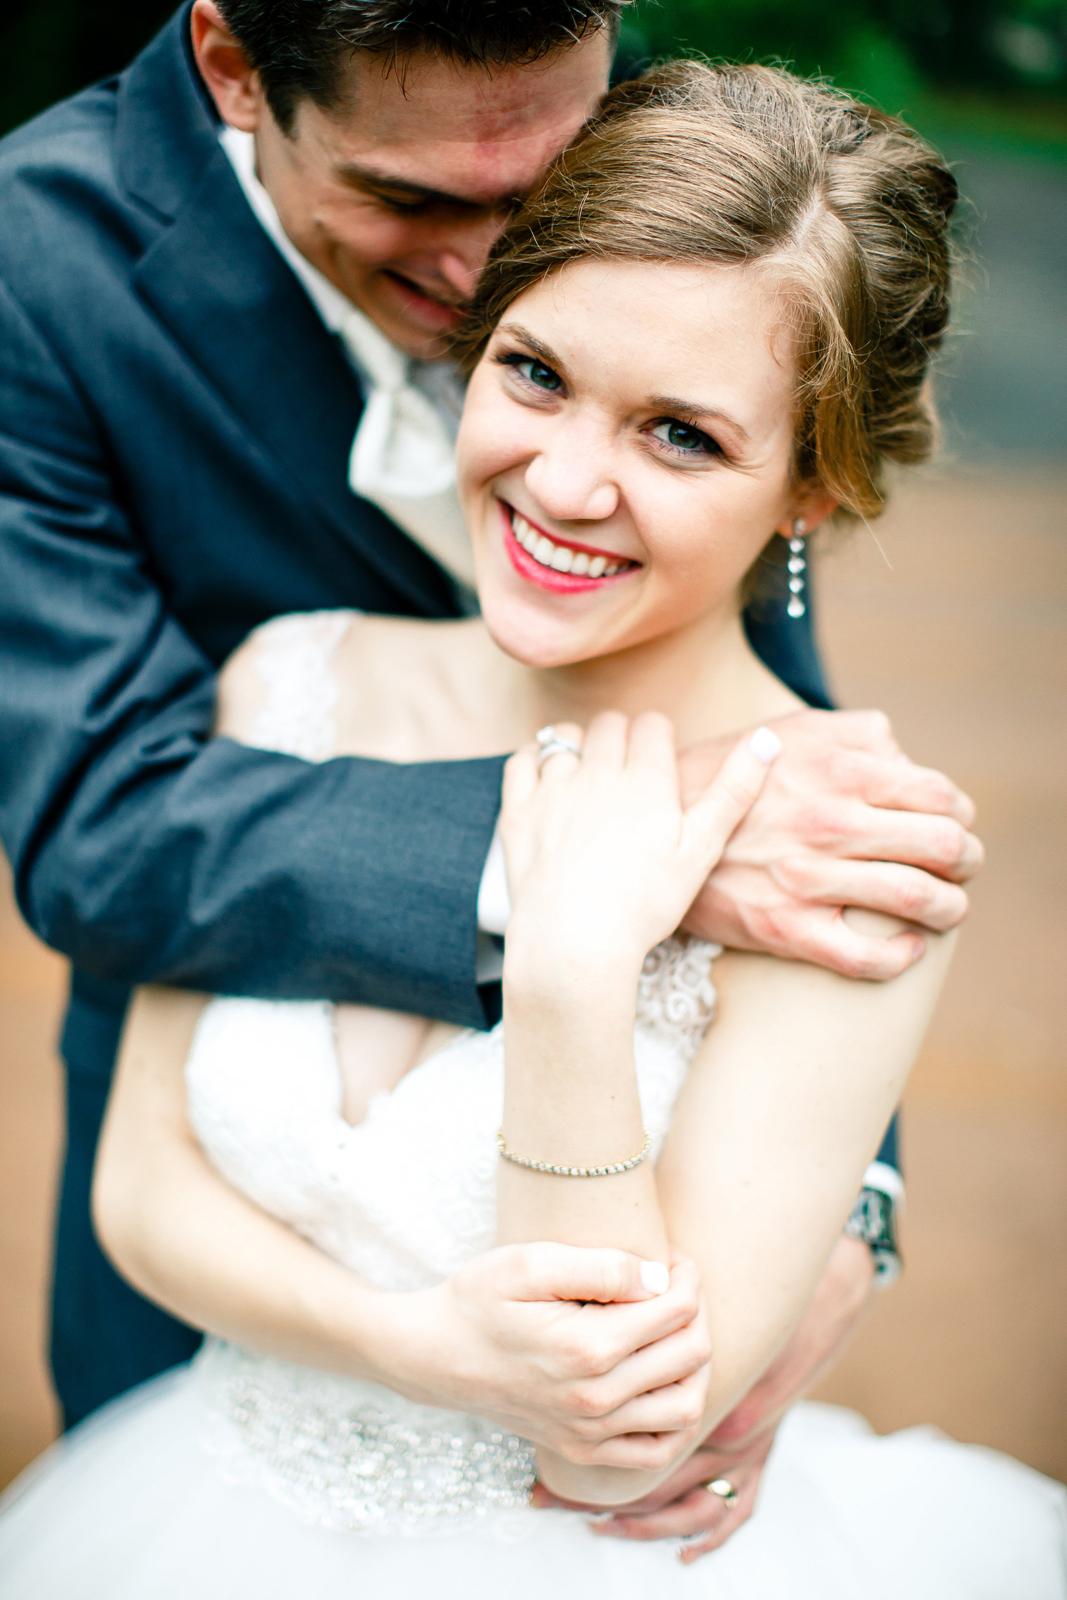 Bridal Portraits Lafayette Square Park Bride Groom St Louis Wedding Photographer Oldani Photography 4.jpg